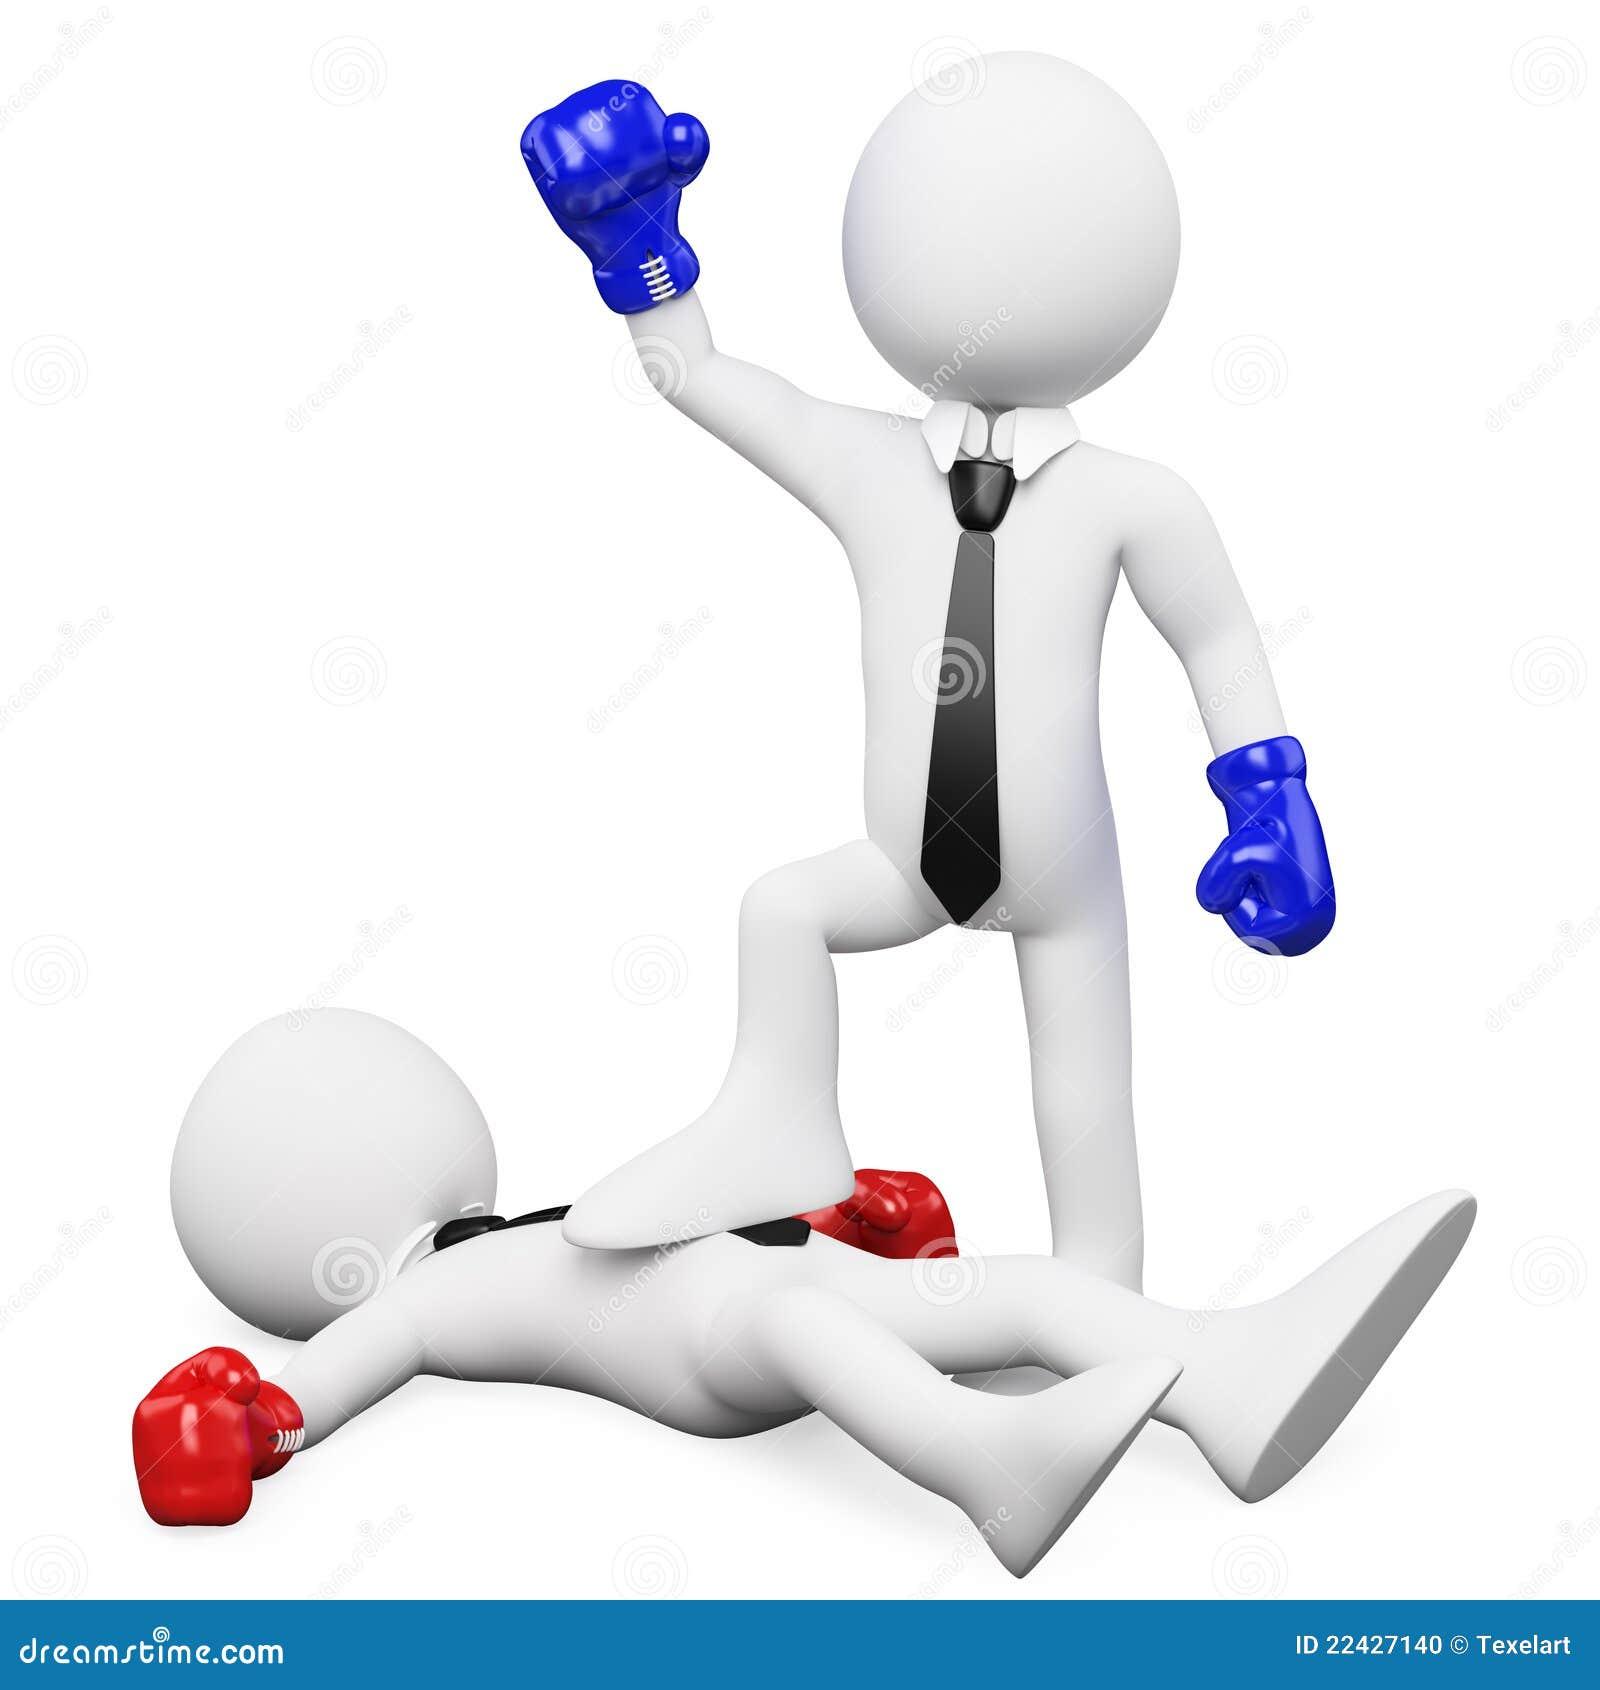 Matchmaking boxing